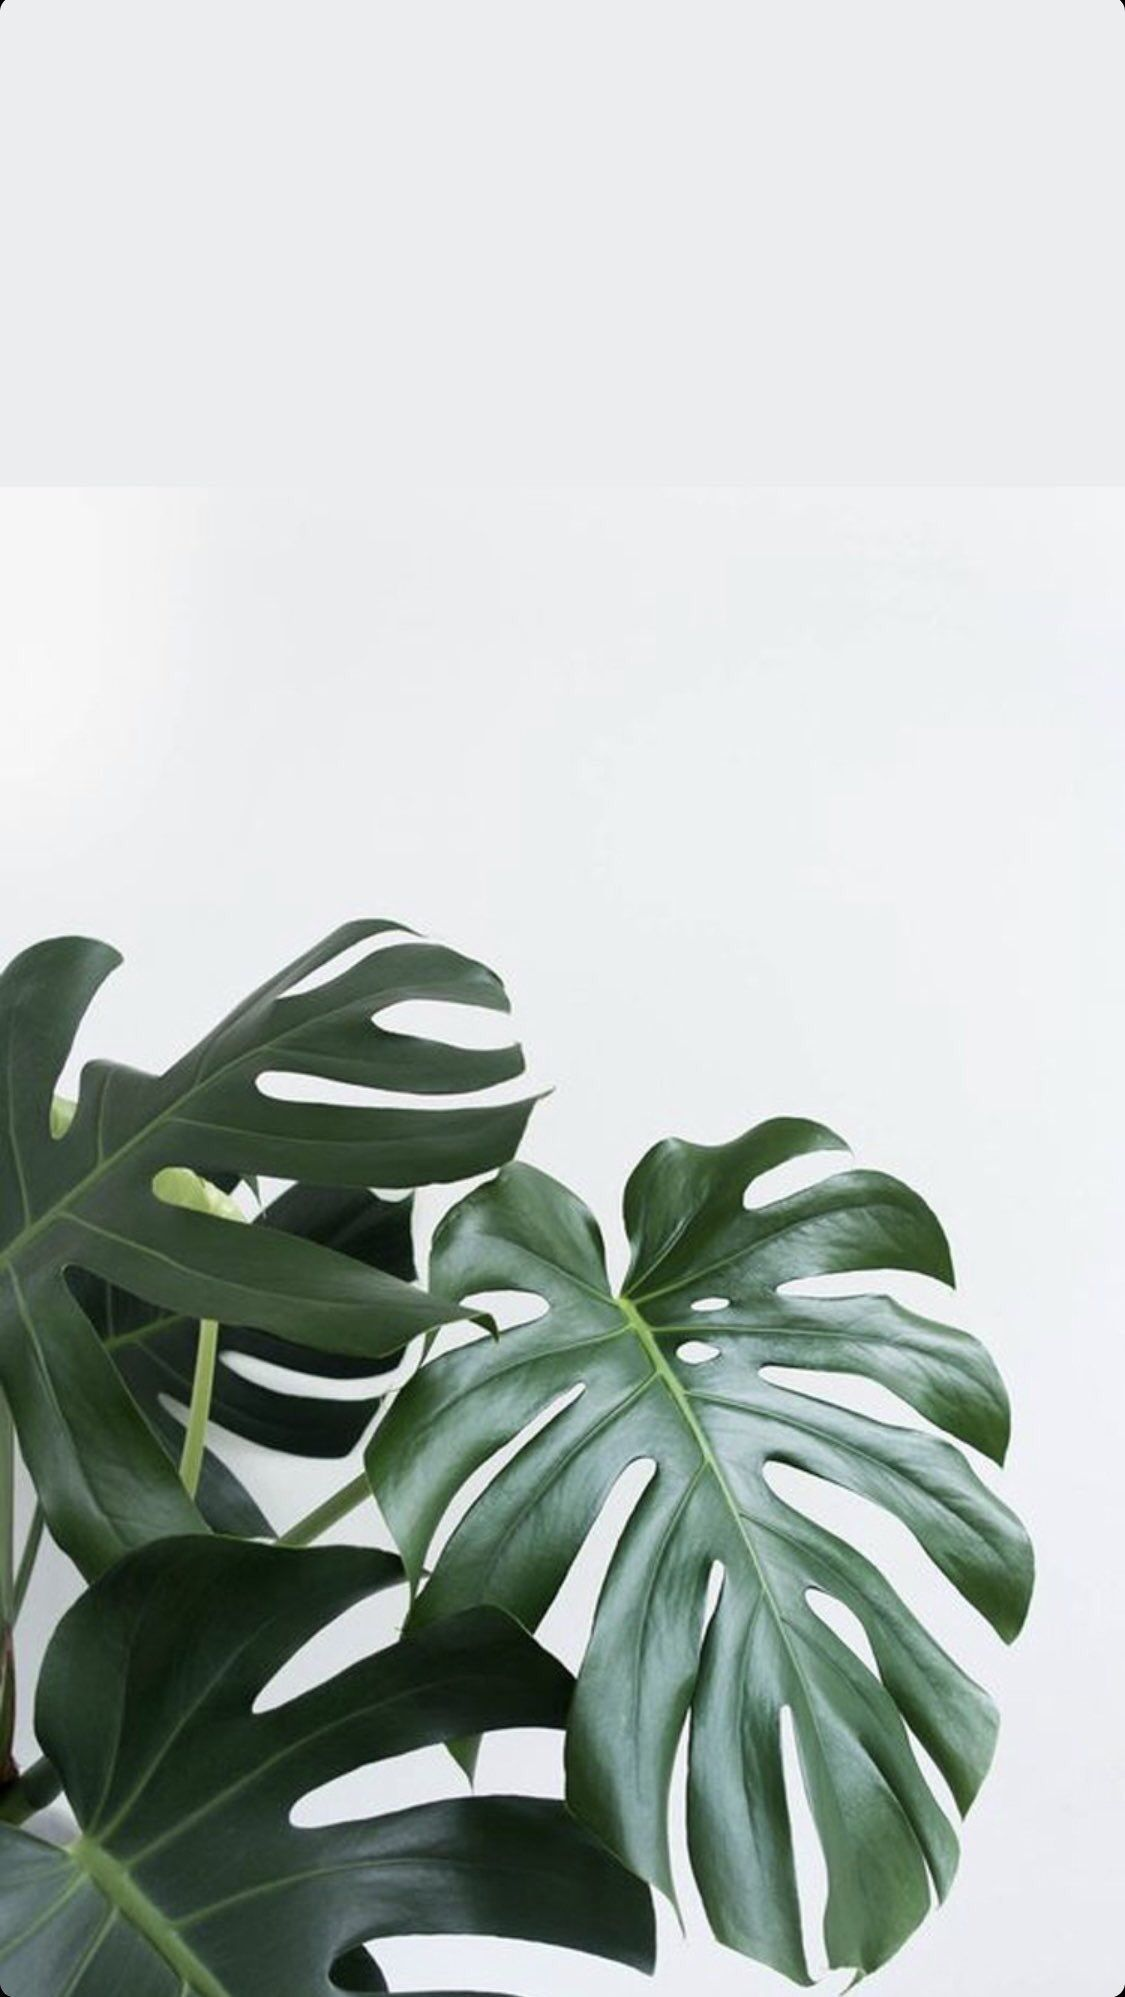 Monstera Deliciosa Flower Leaf Green Plant Botany Plant Wallpaper Leaves Wallpaper Iphone Plant Aesthetic